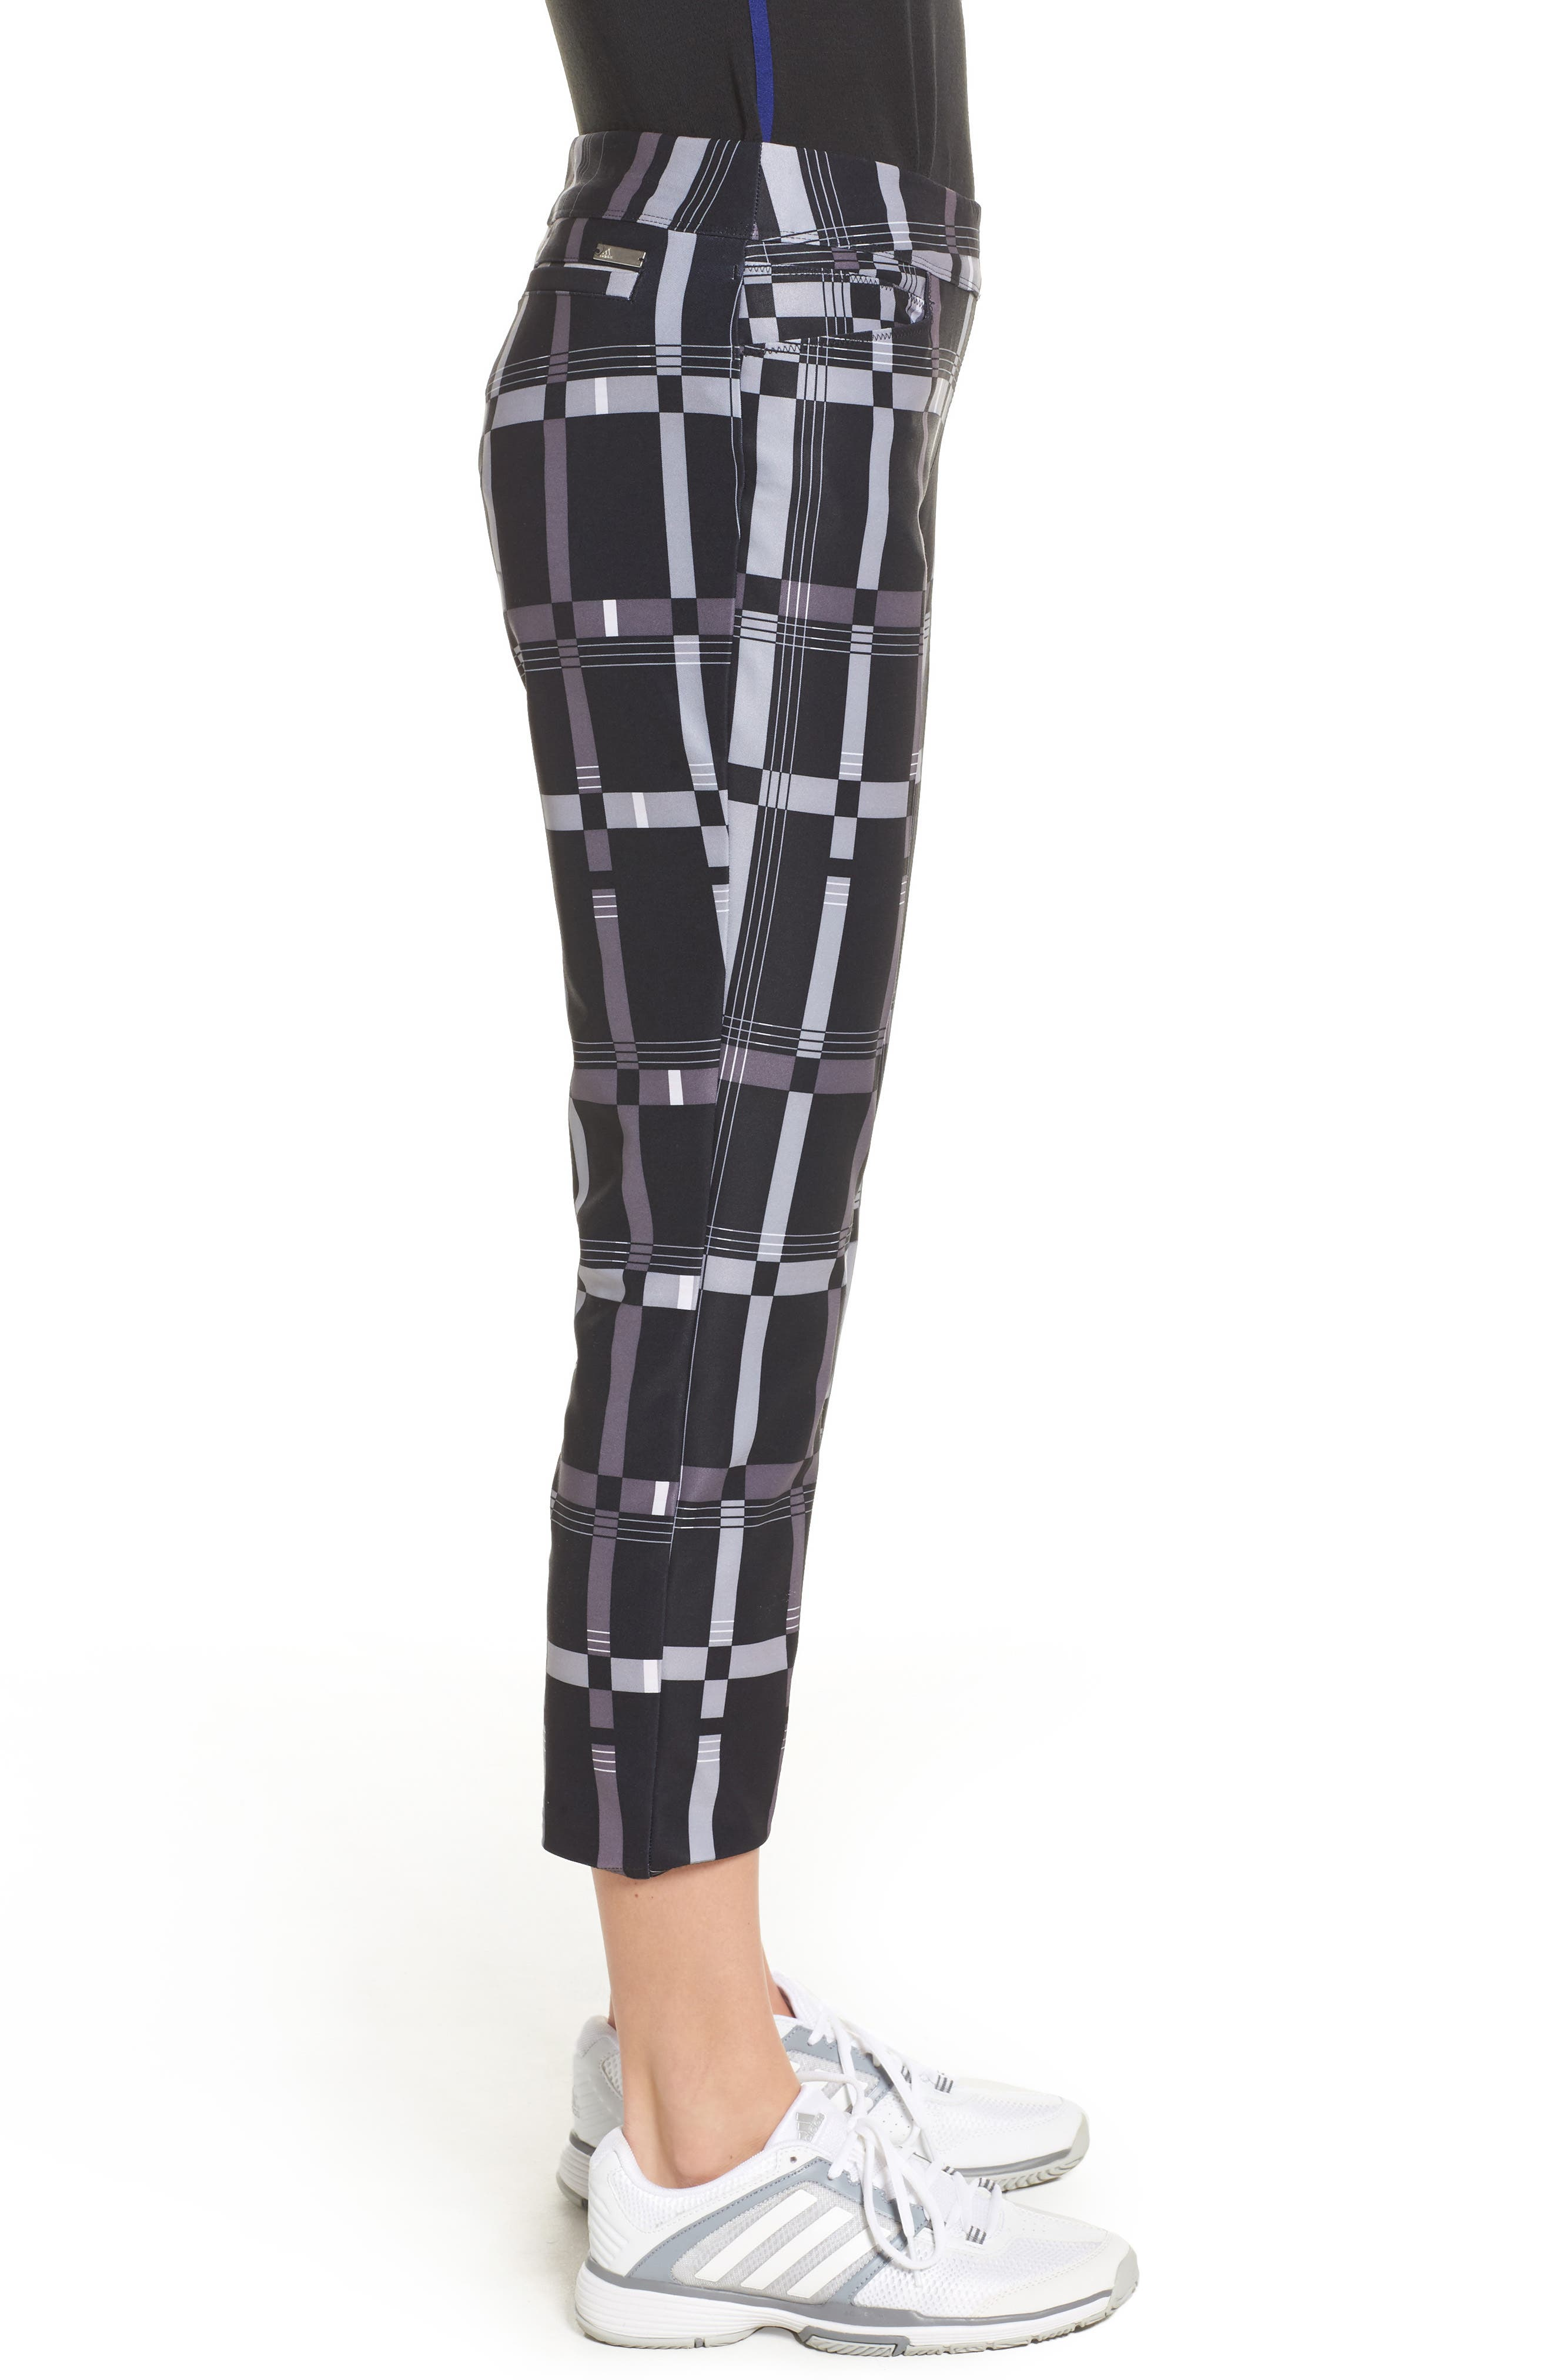 adistar Ankle Pants,                             Alternate thumbnail 3, color,                             001